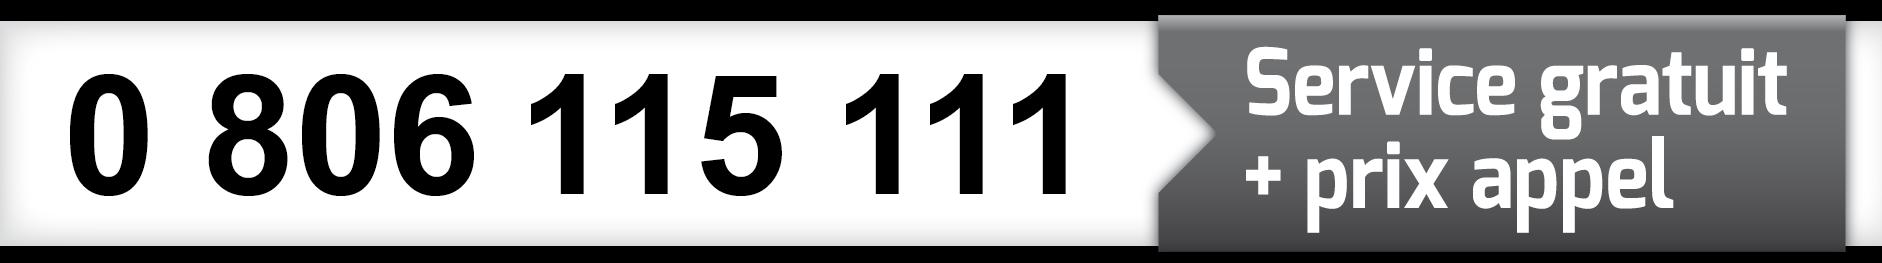 0 806 115 111